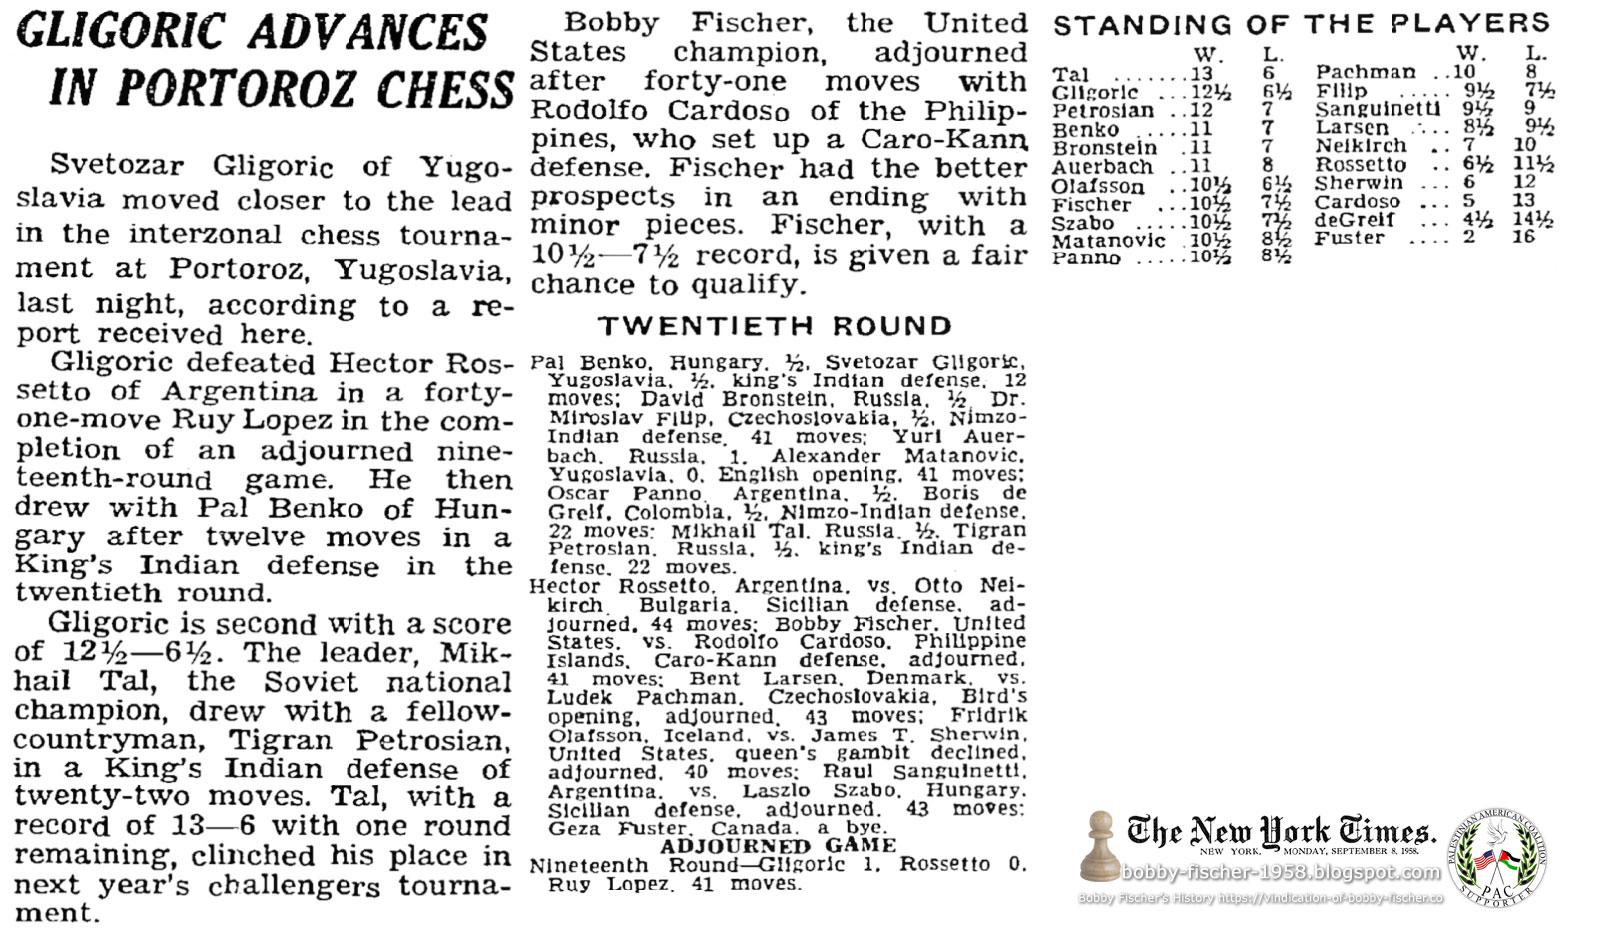 Gligoric Advances In Portoroz Chess: Bobby Fischer Adjourns After 41 Moves with Cardoso